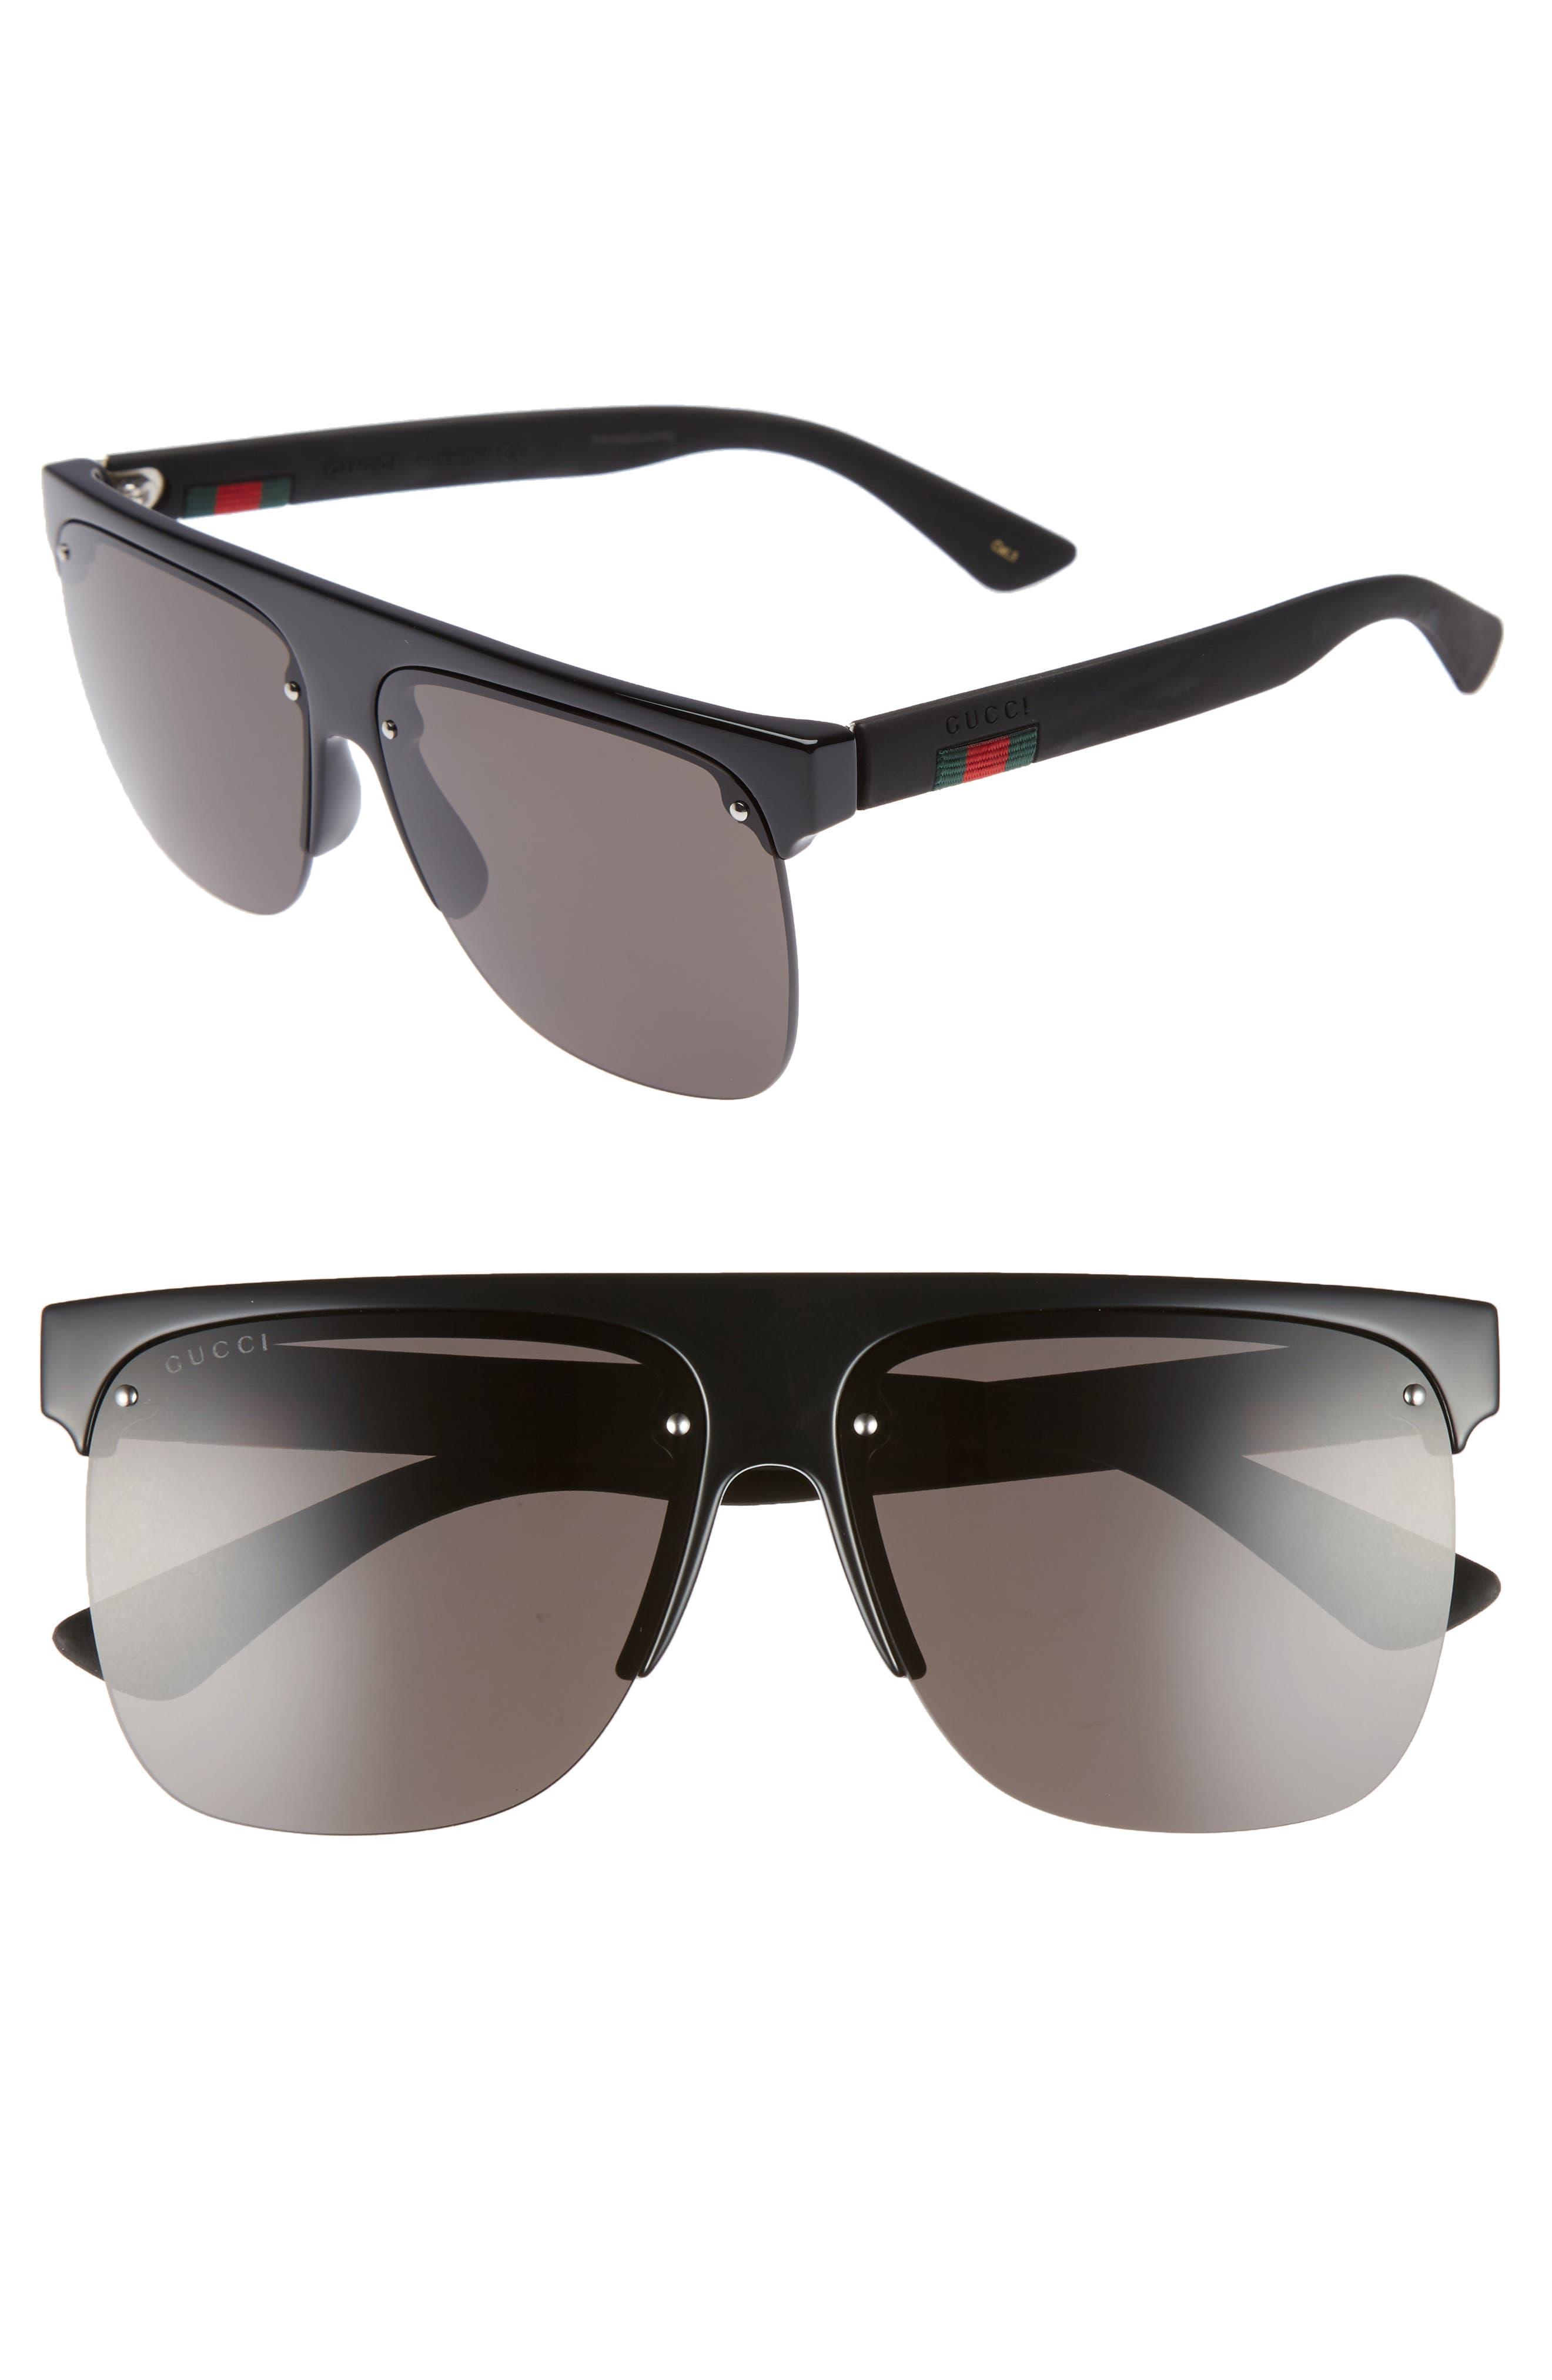 60mm Semi Rimless Polarized Sunglasses,                             Main thumbnail 2, color,